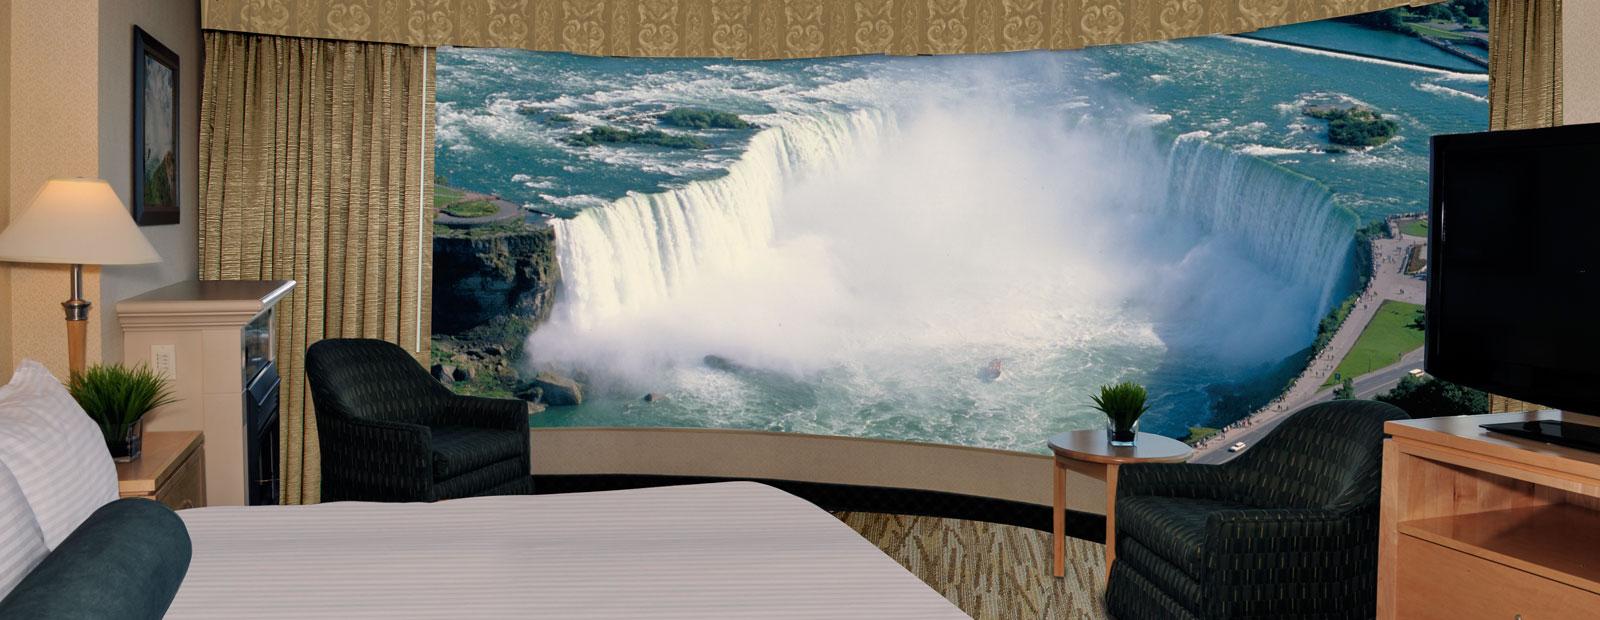 Ranked #22 of 127 hotels in Niagara Falls